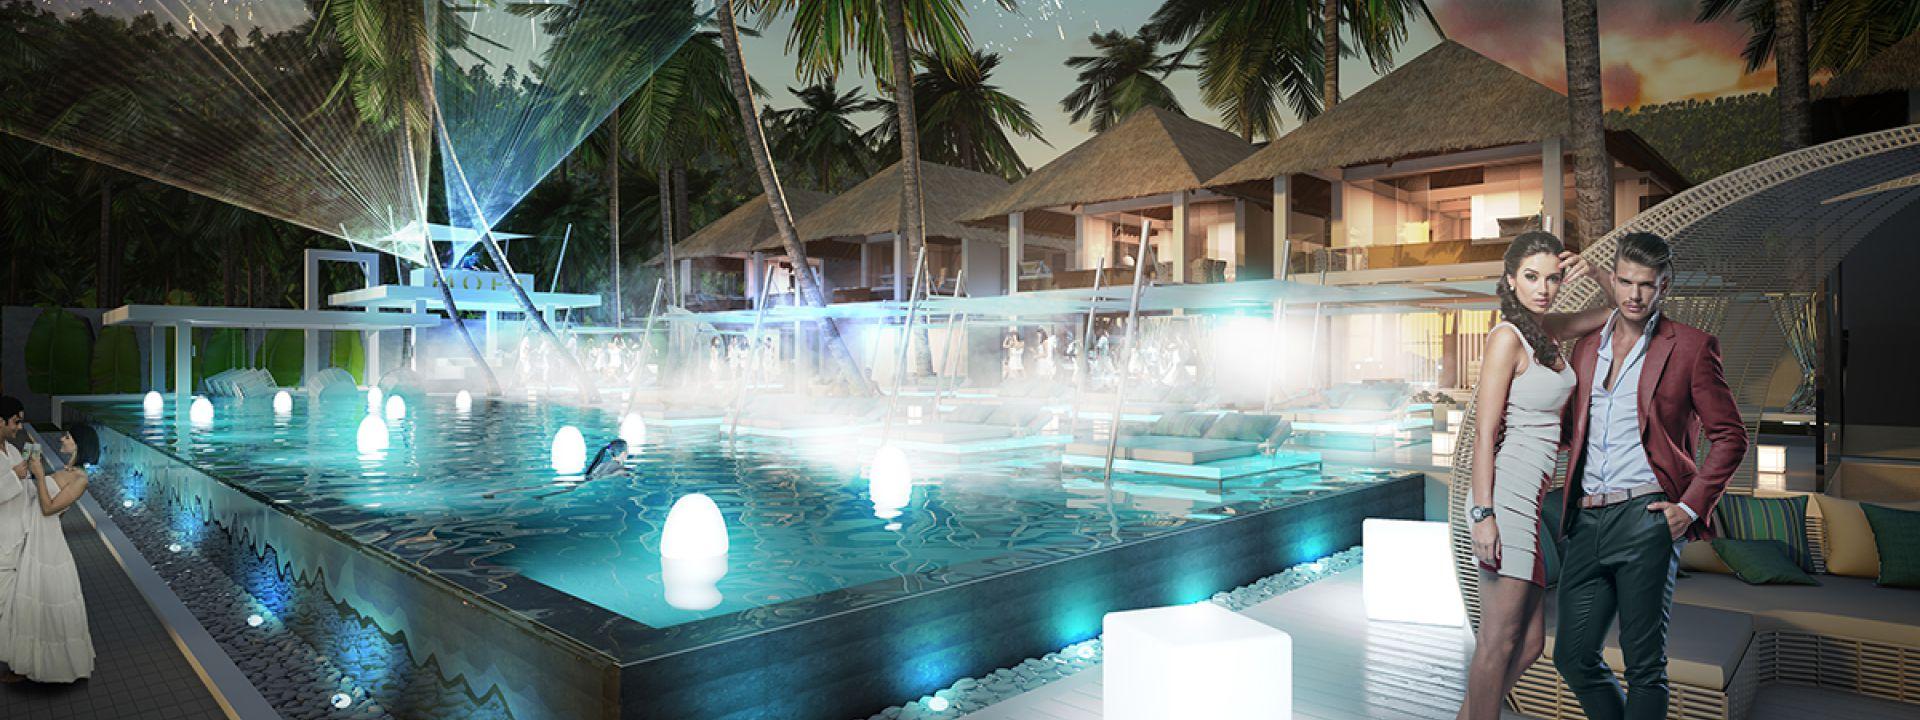 7 Secrets Resort & Wellness Retreat , Michelin starred - Lombok / Indonesia